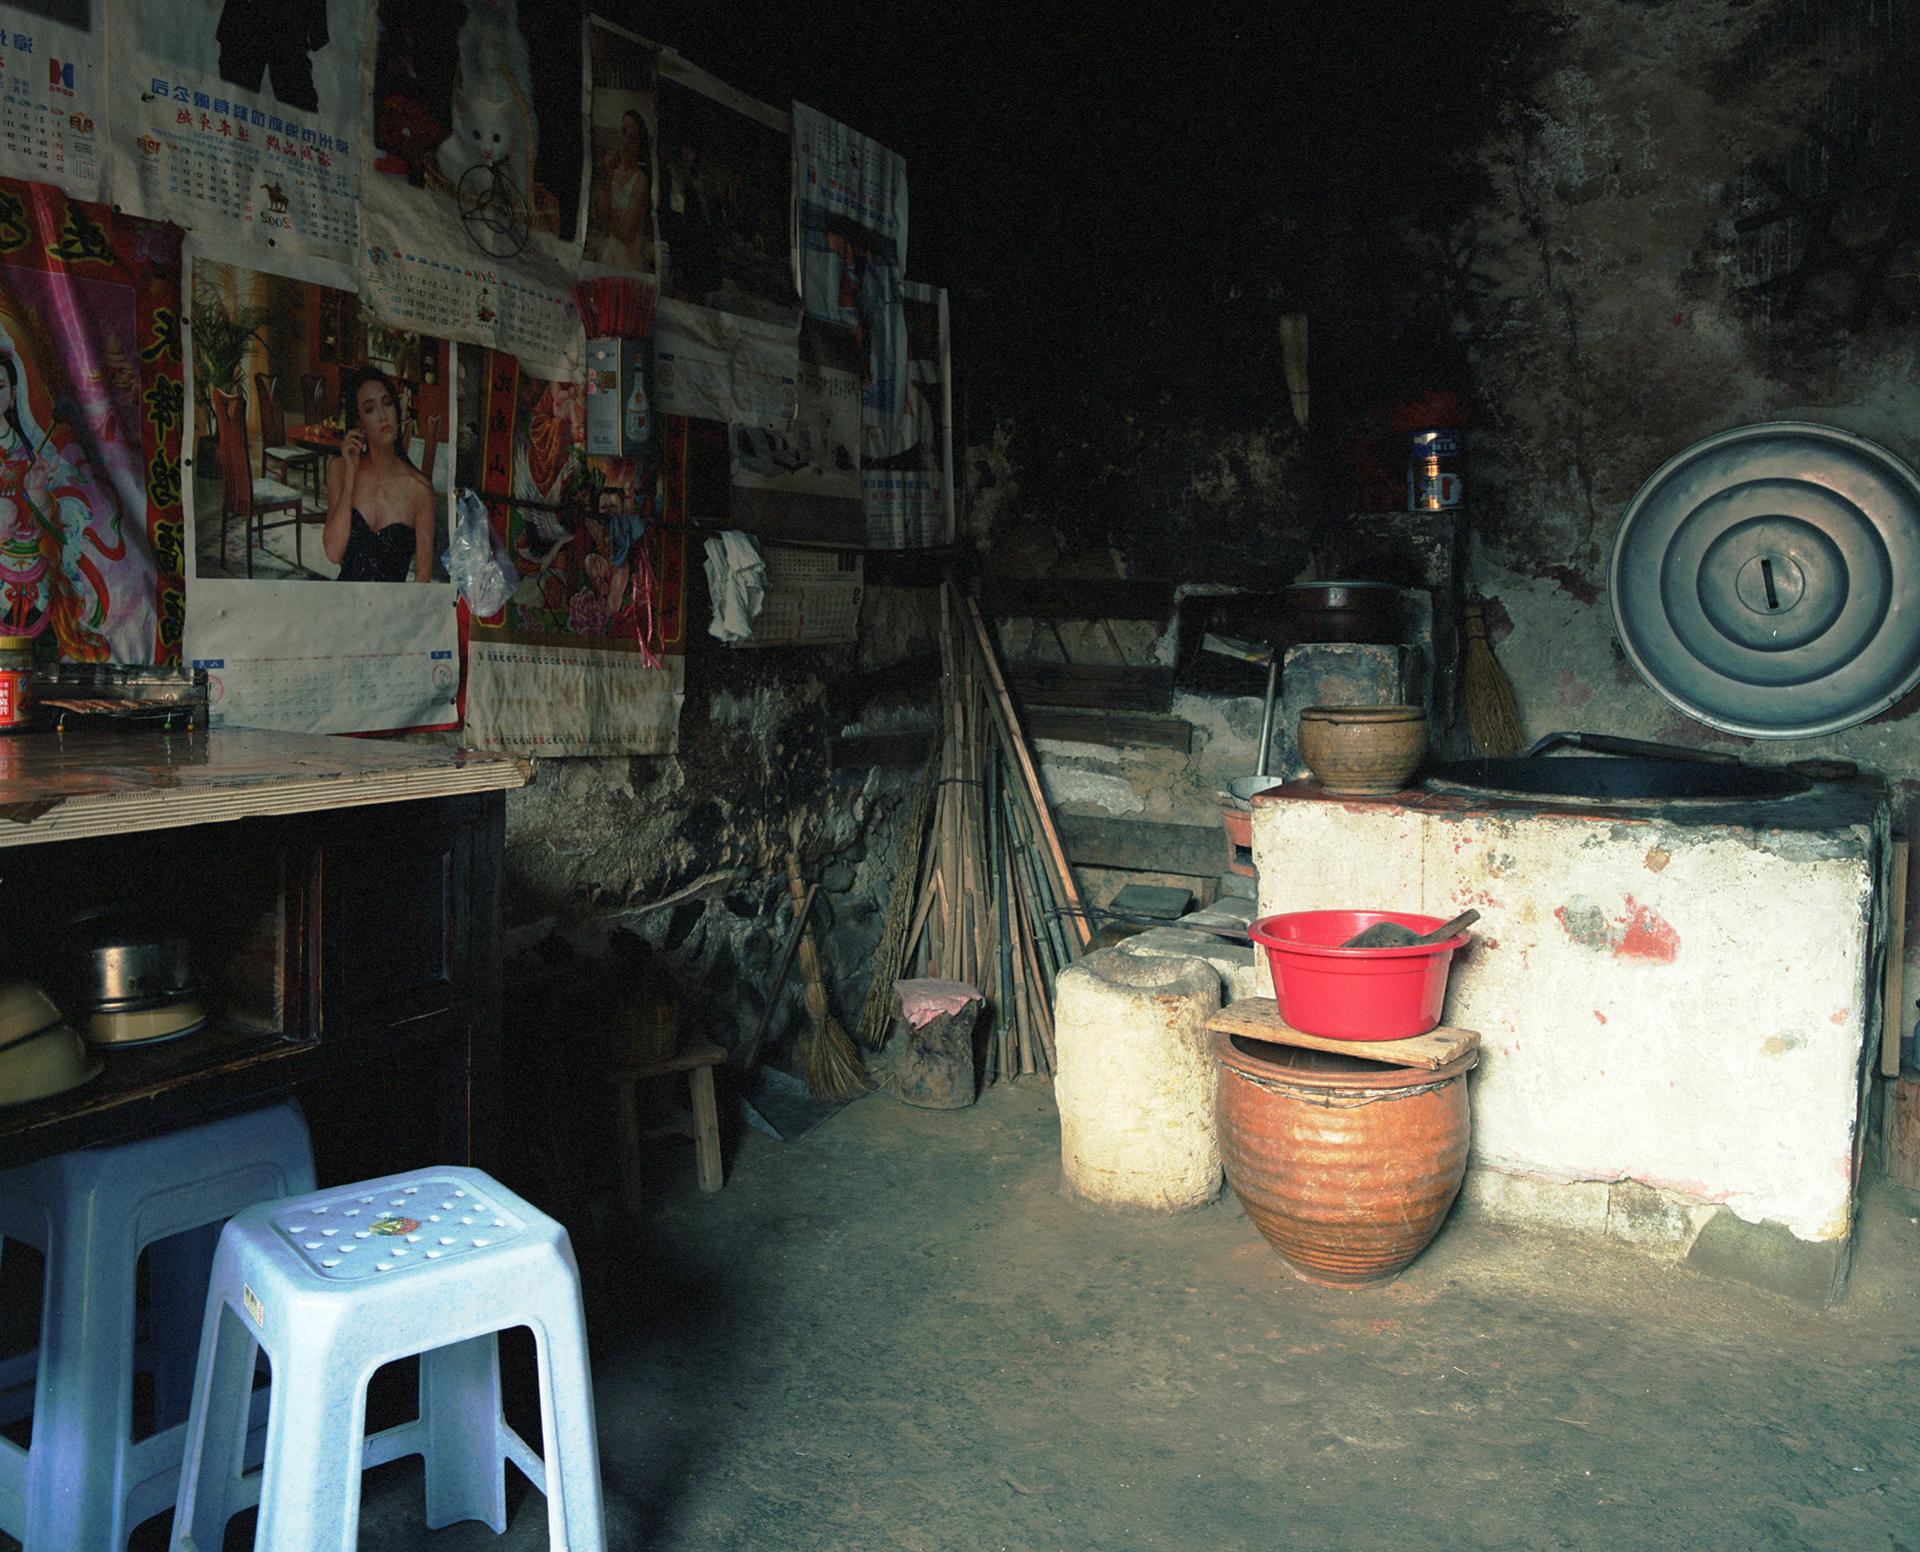 2009 Fujian - private space in the communal Hakka house.